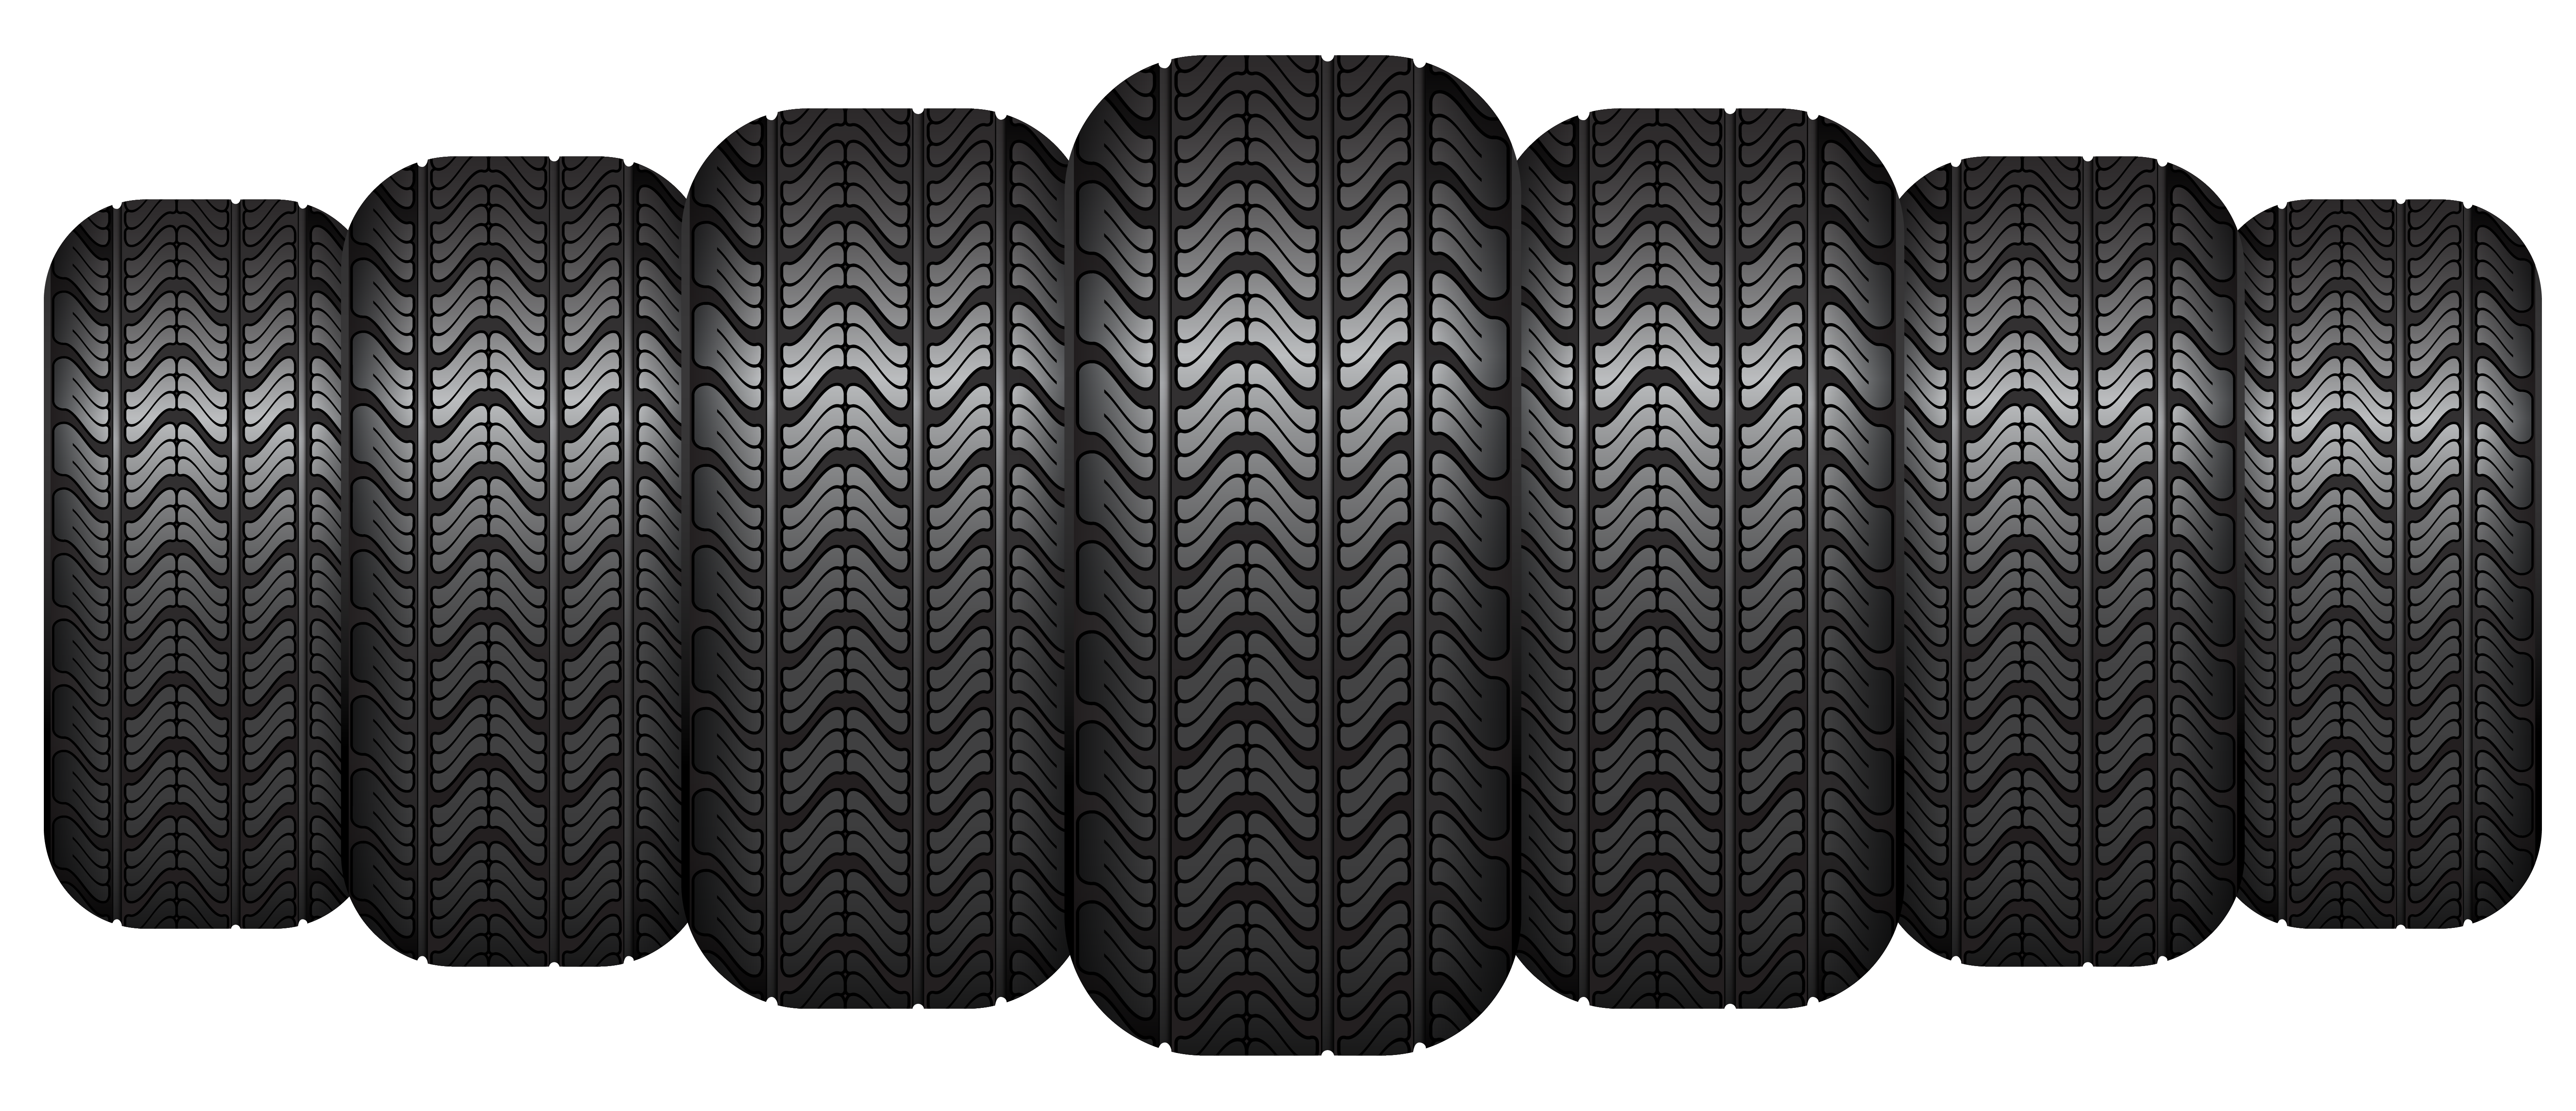 Wheel clipart rubber tire. Car tires png best